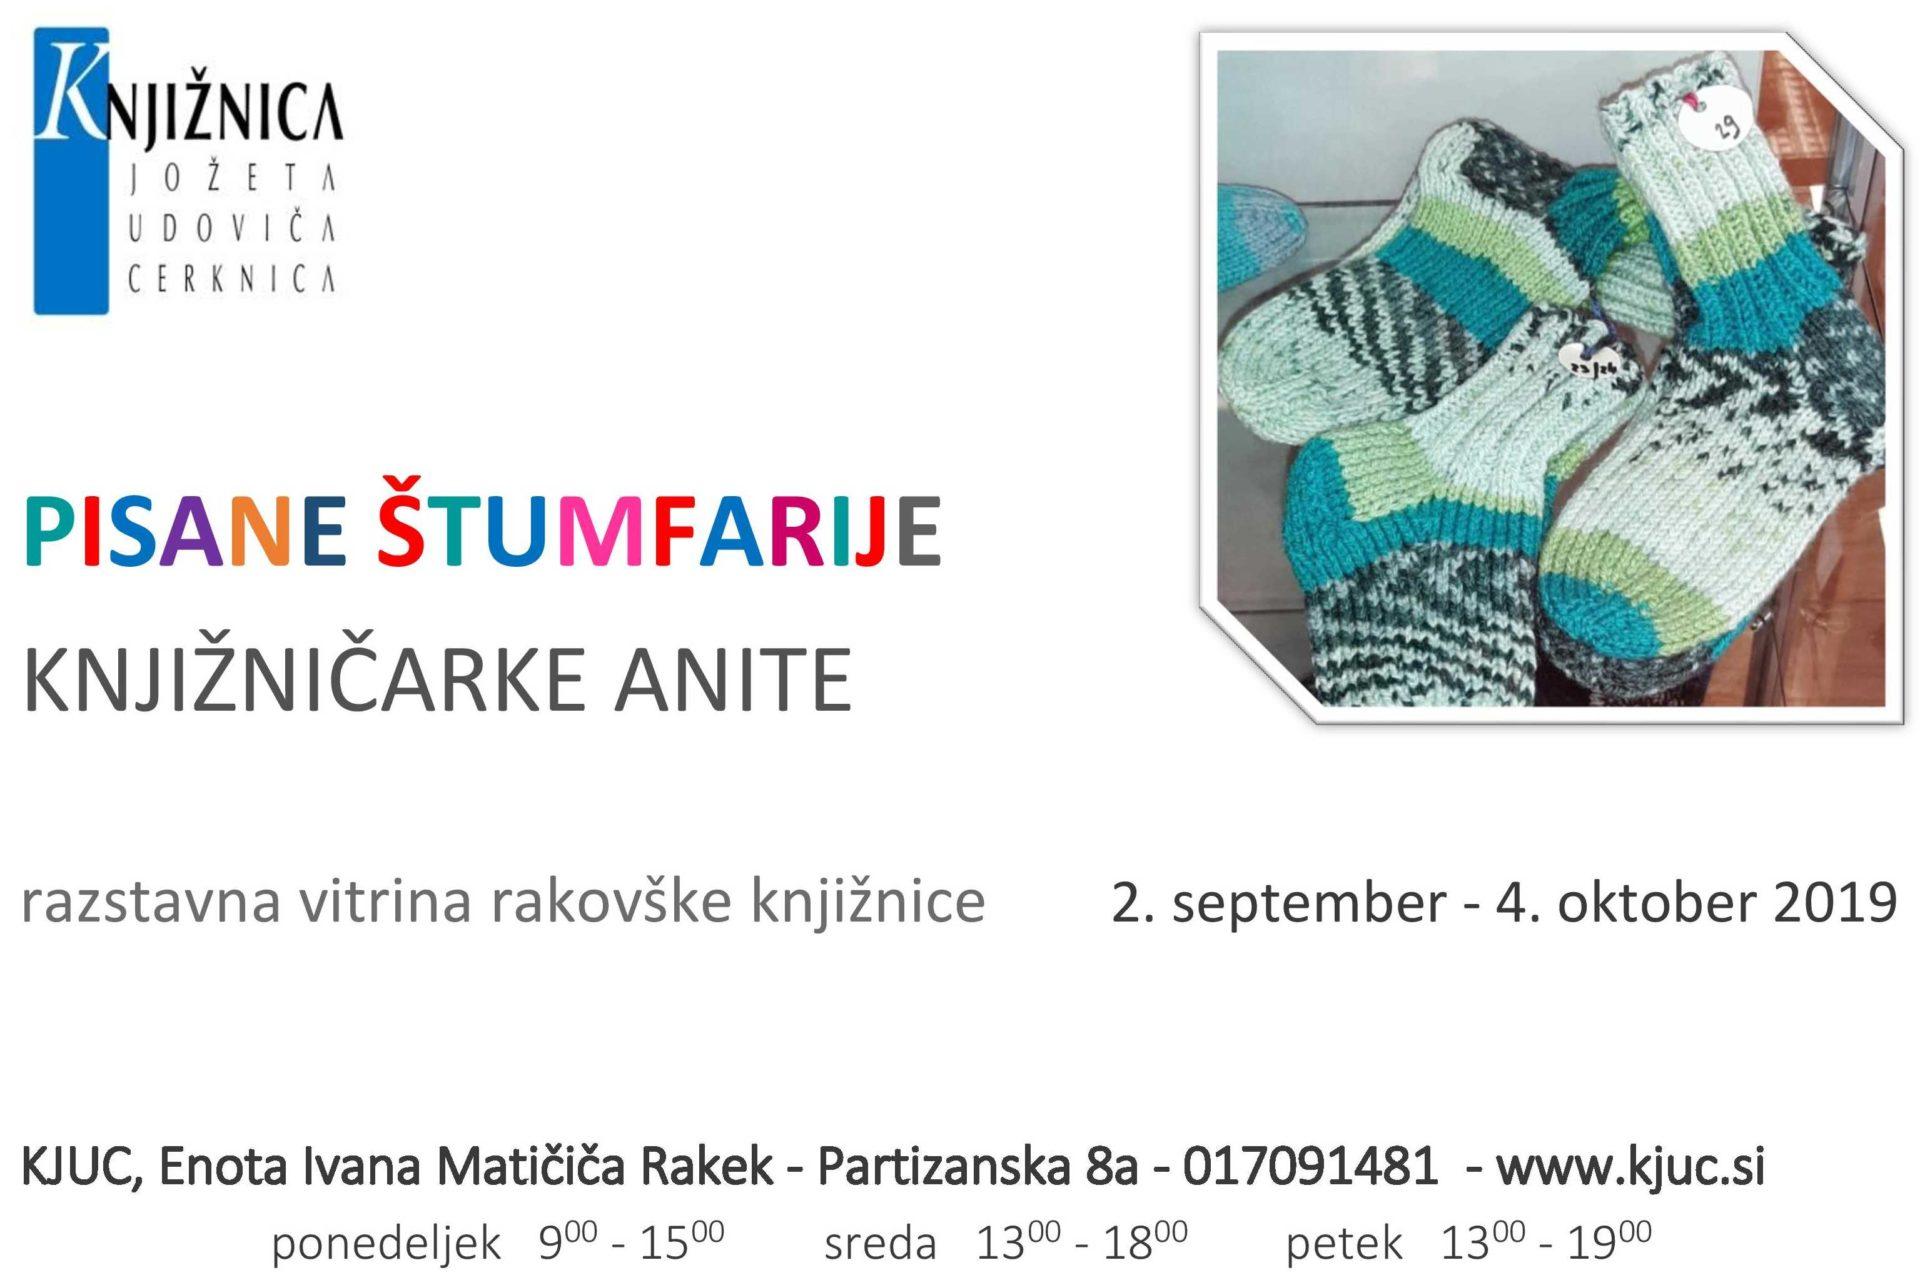 cover 9 - Pisane štumfarije knjižničarke Anite